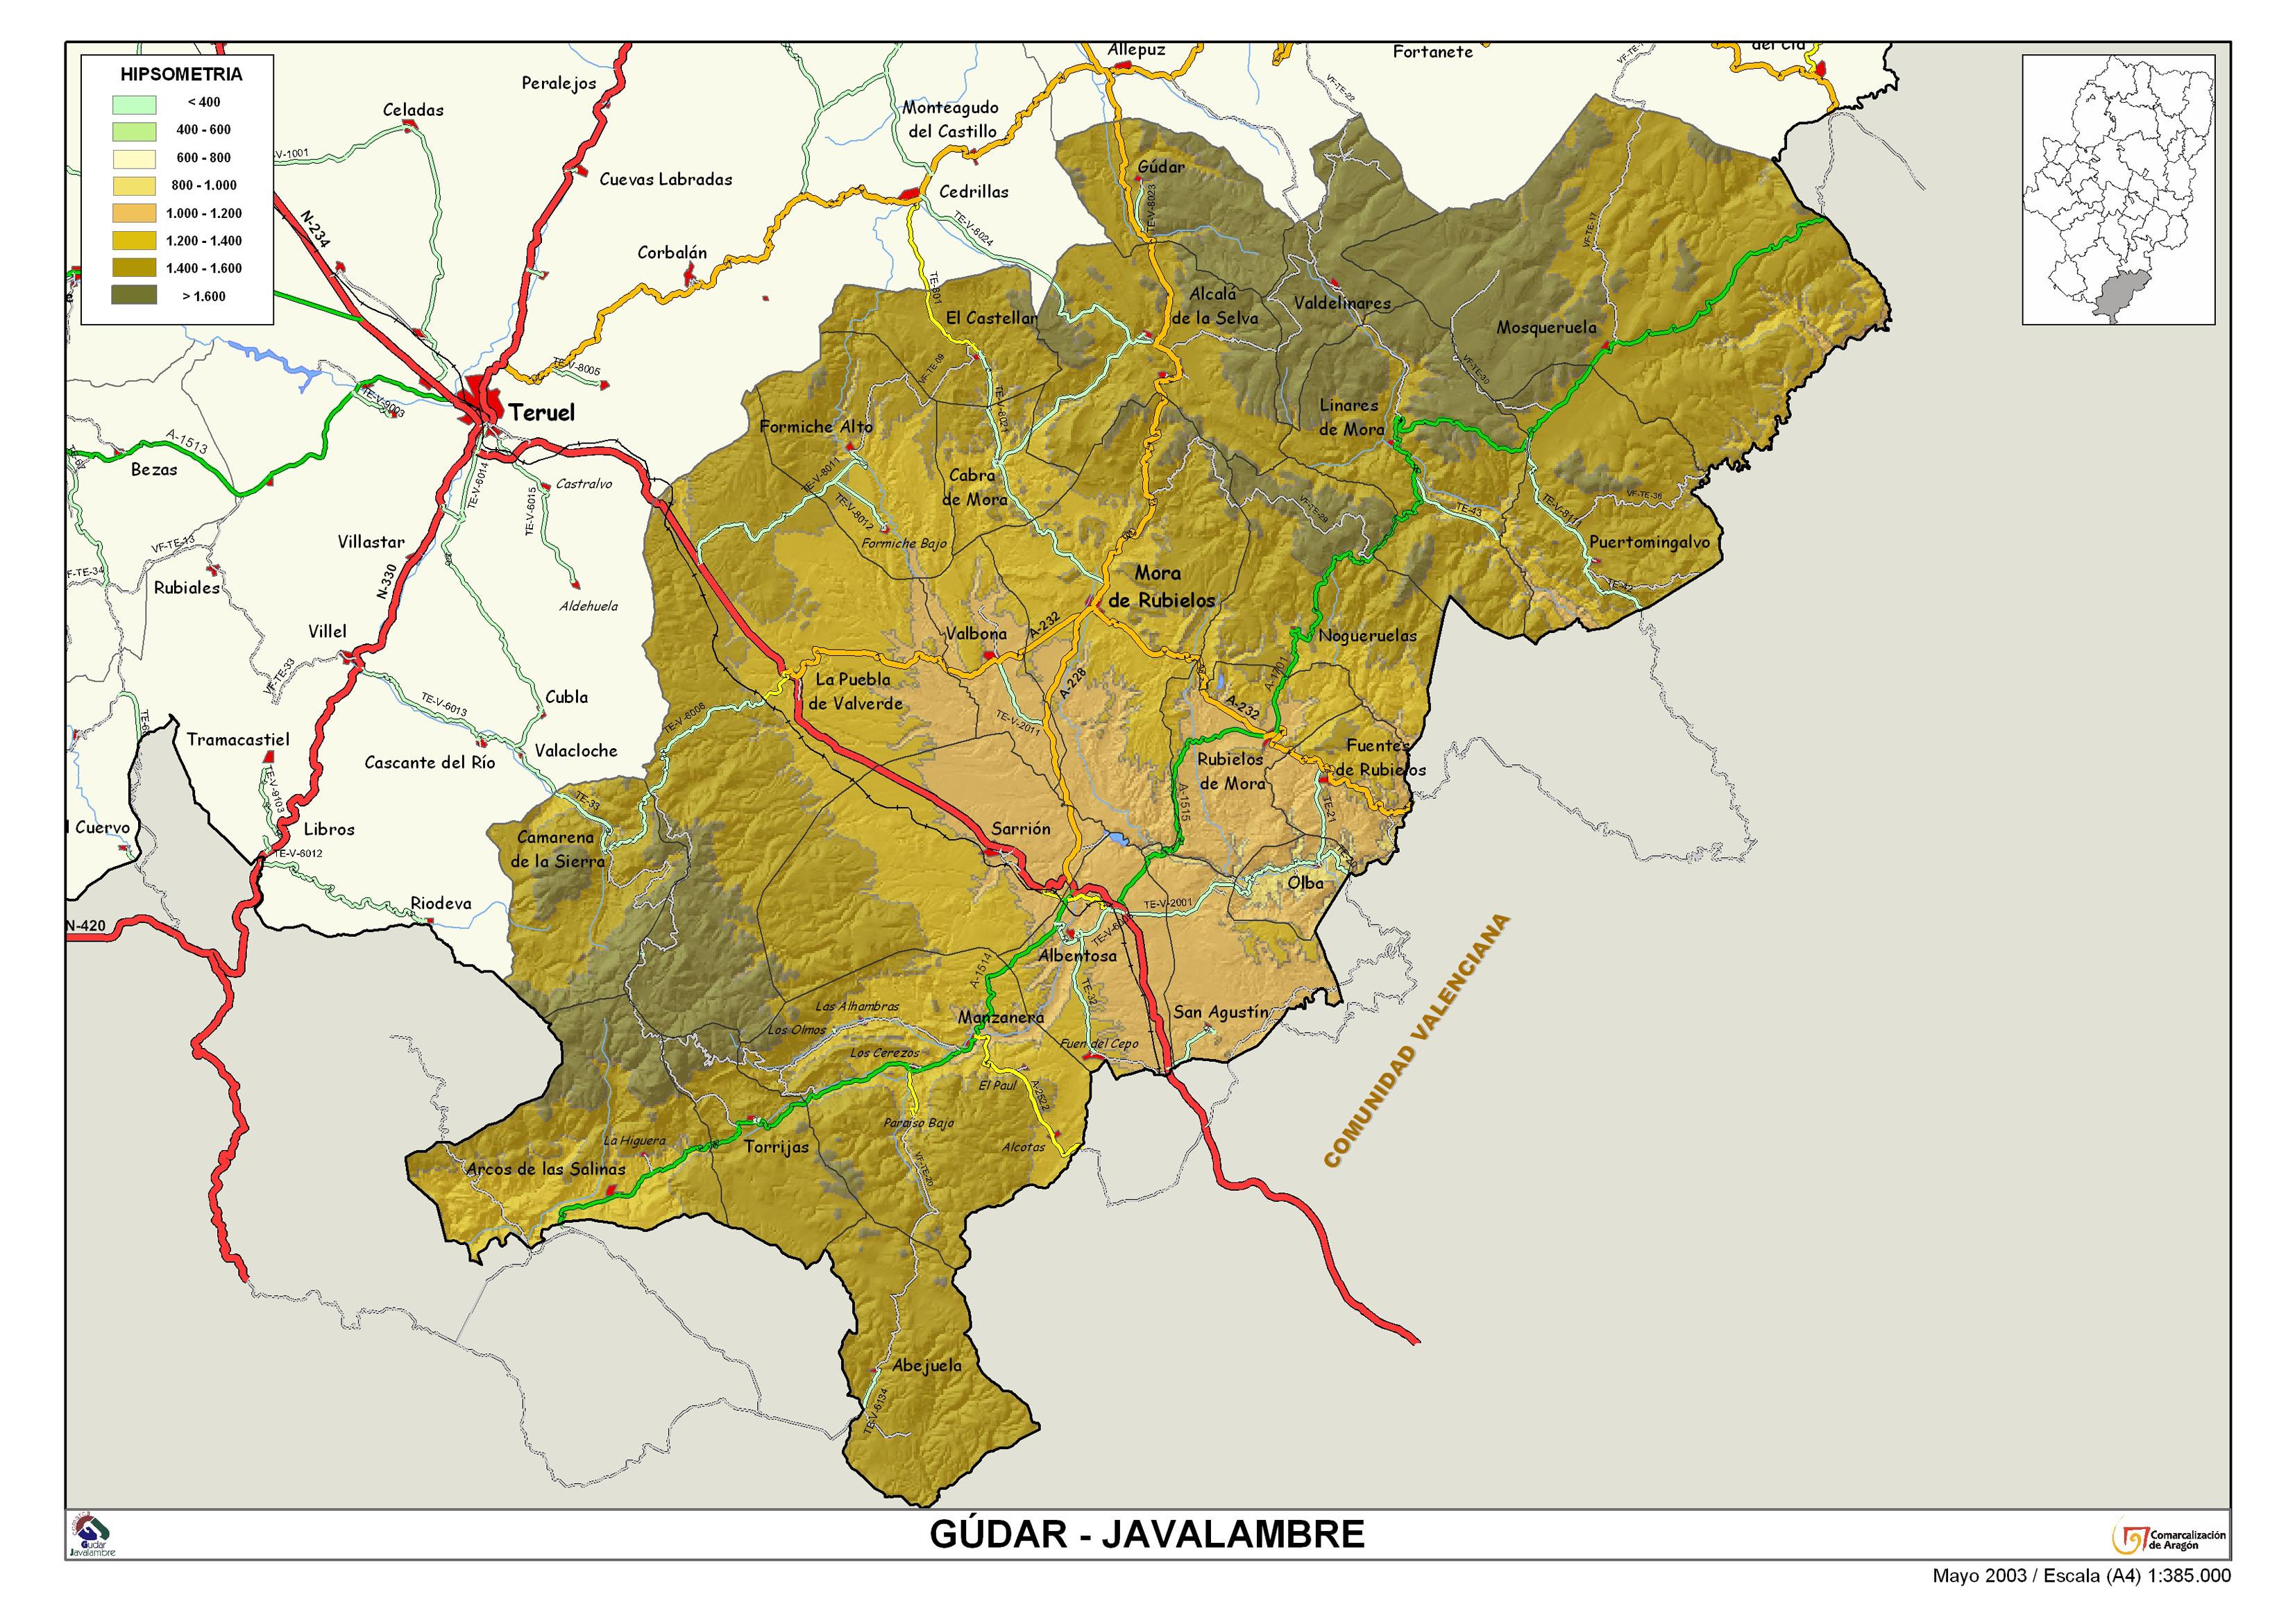 Sierra De Javalambre Mapa.Gudar Javalambre